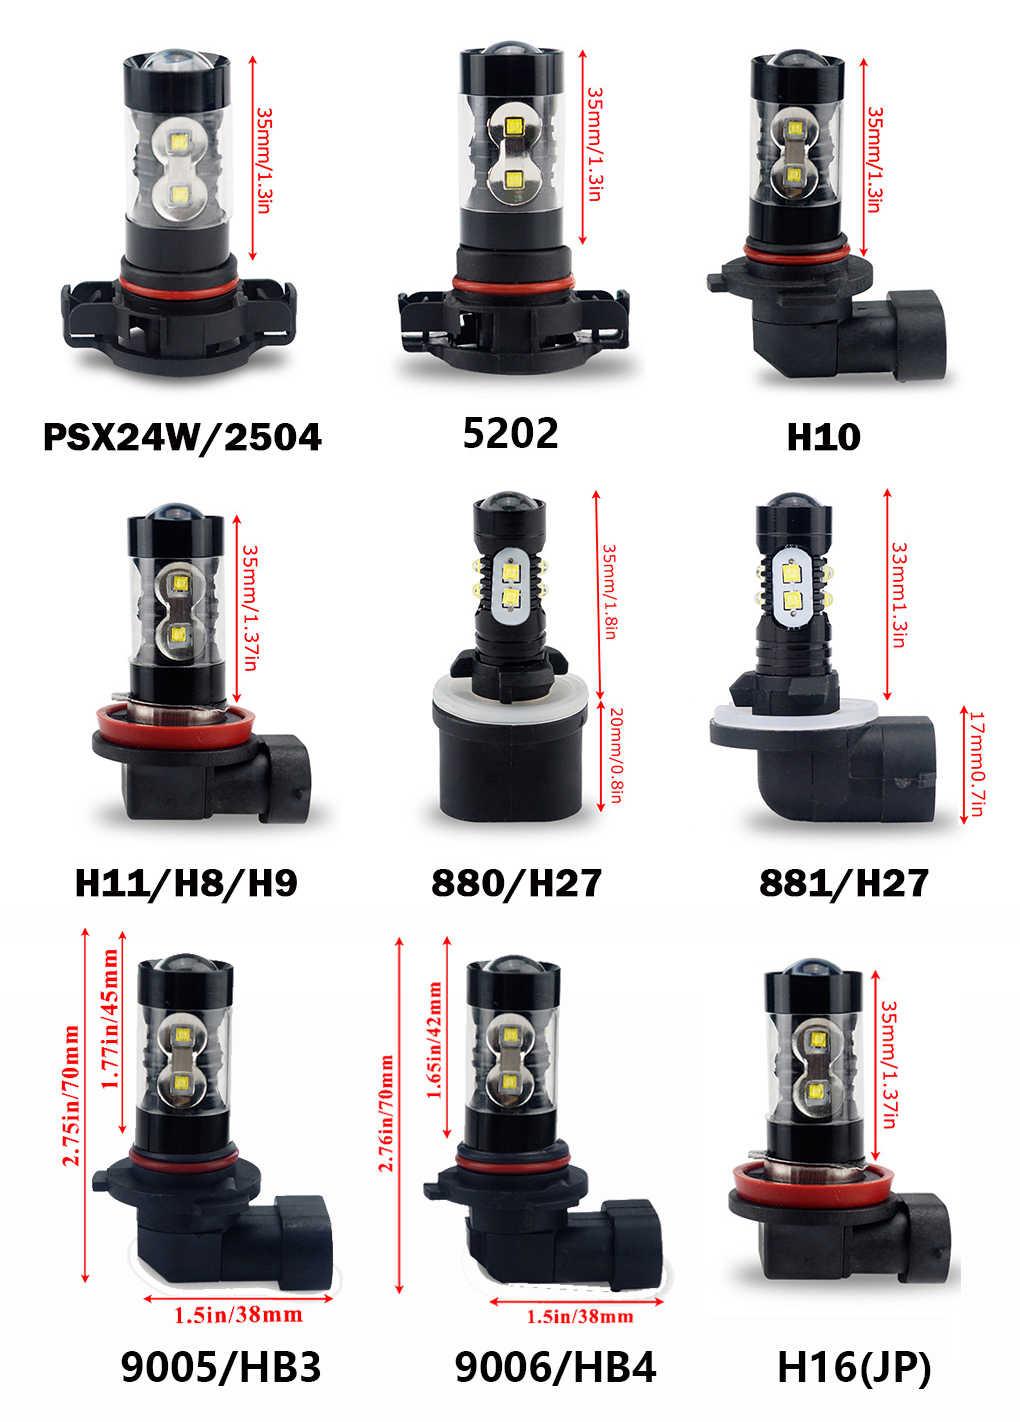 SHDLIFE PSX24W H16 H8 H11 H10 9145 9006 HB4 H7 coche luces de niebla DRL LED para Toyota Tacoma Tundra Corolla auris Toyota Camry Yaris Avensis